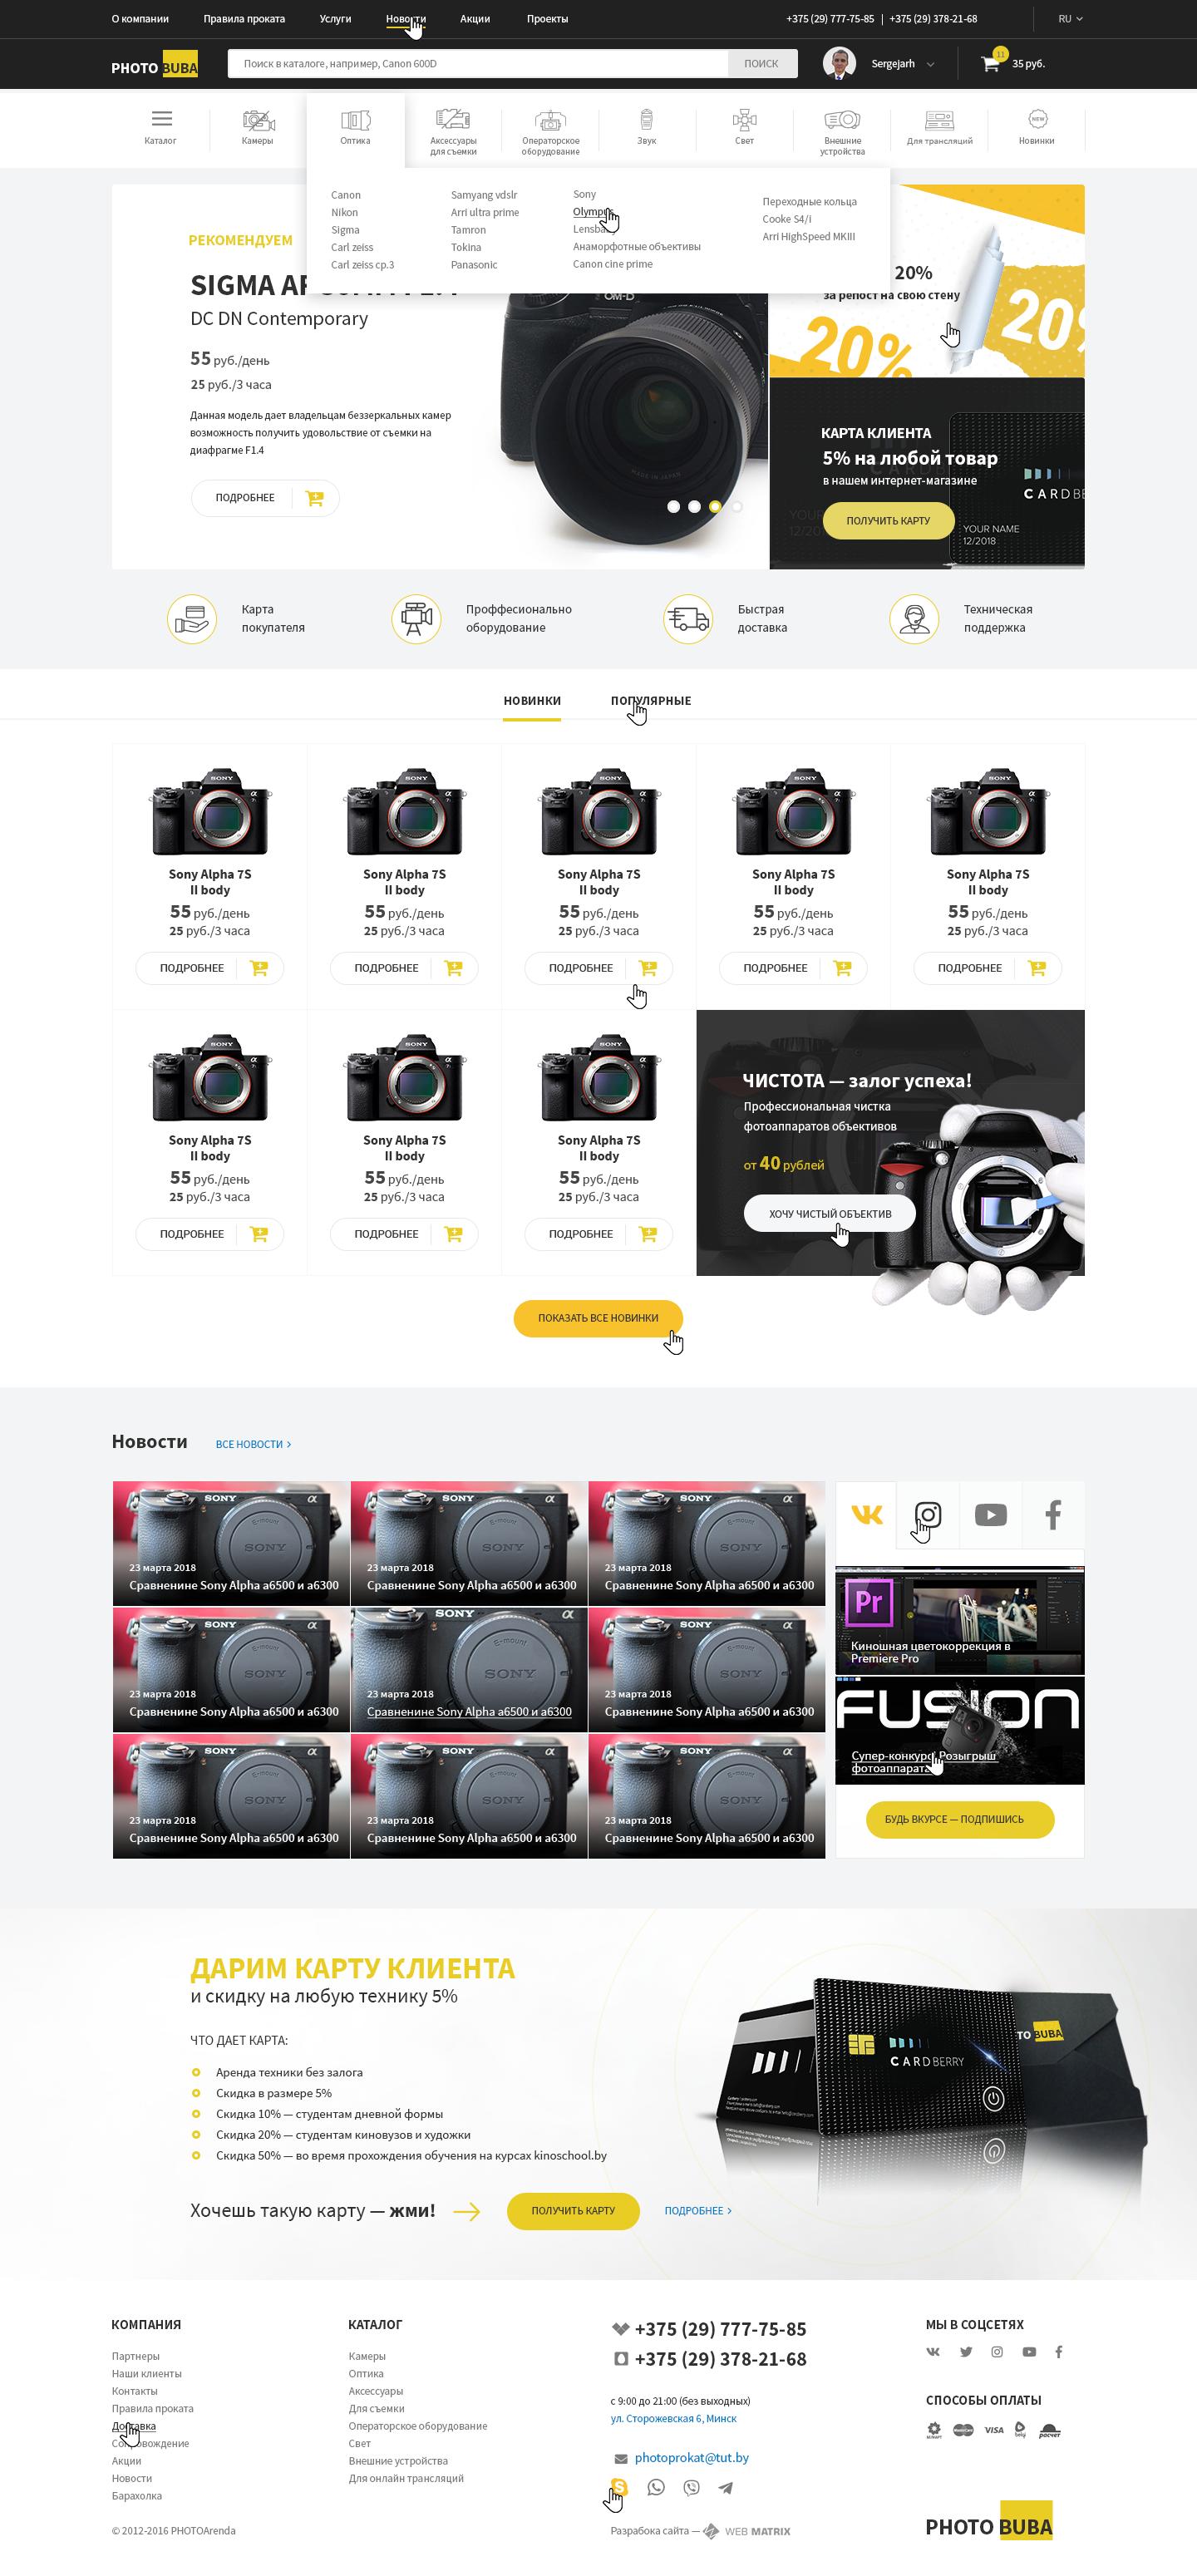 Интернет-магазин / Аренде фототехники - Фотобуба